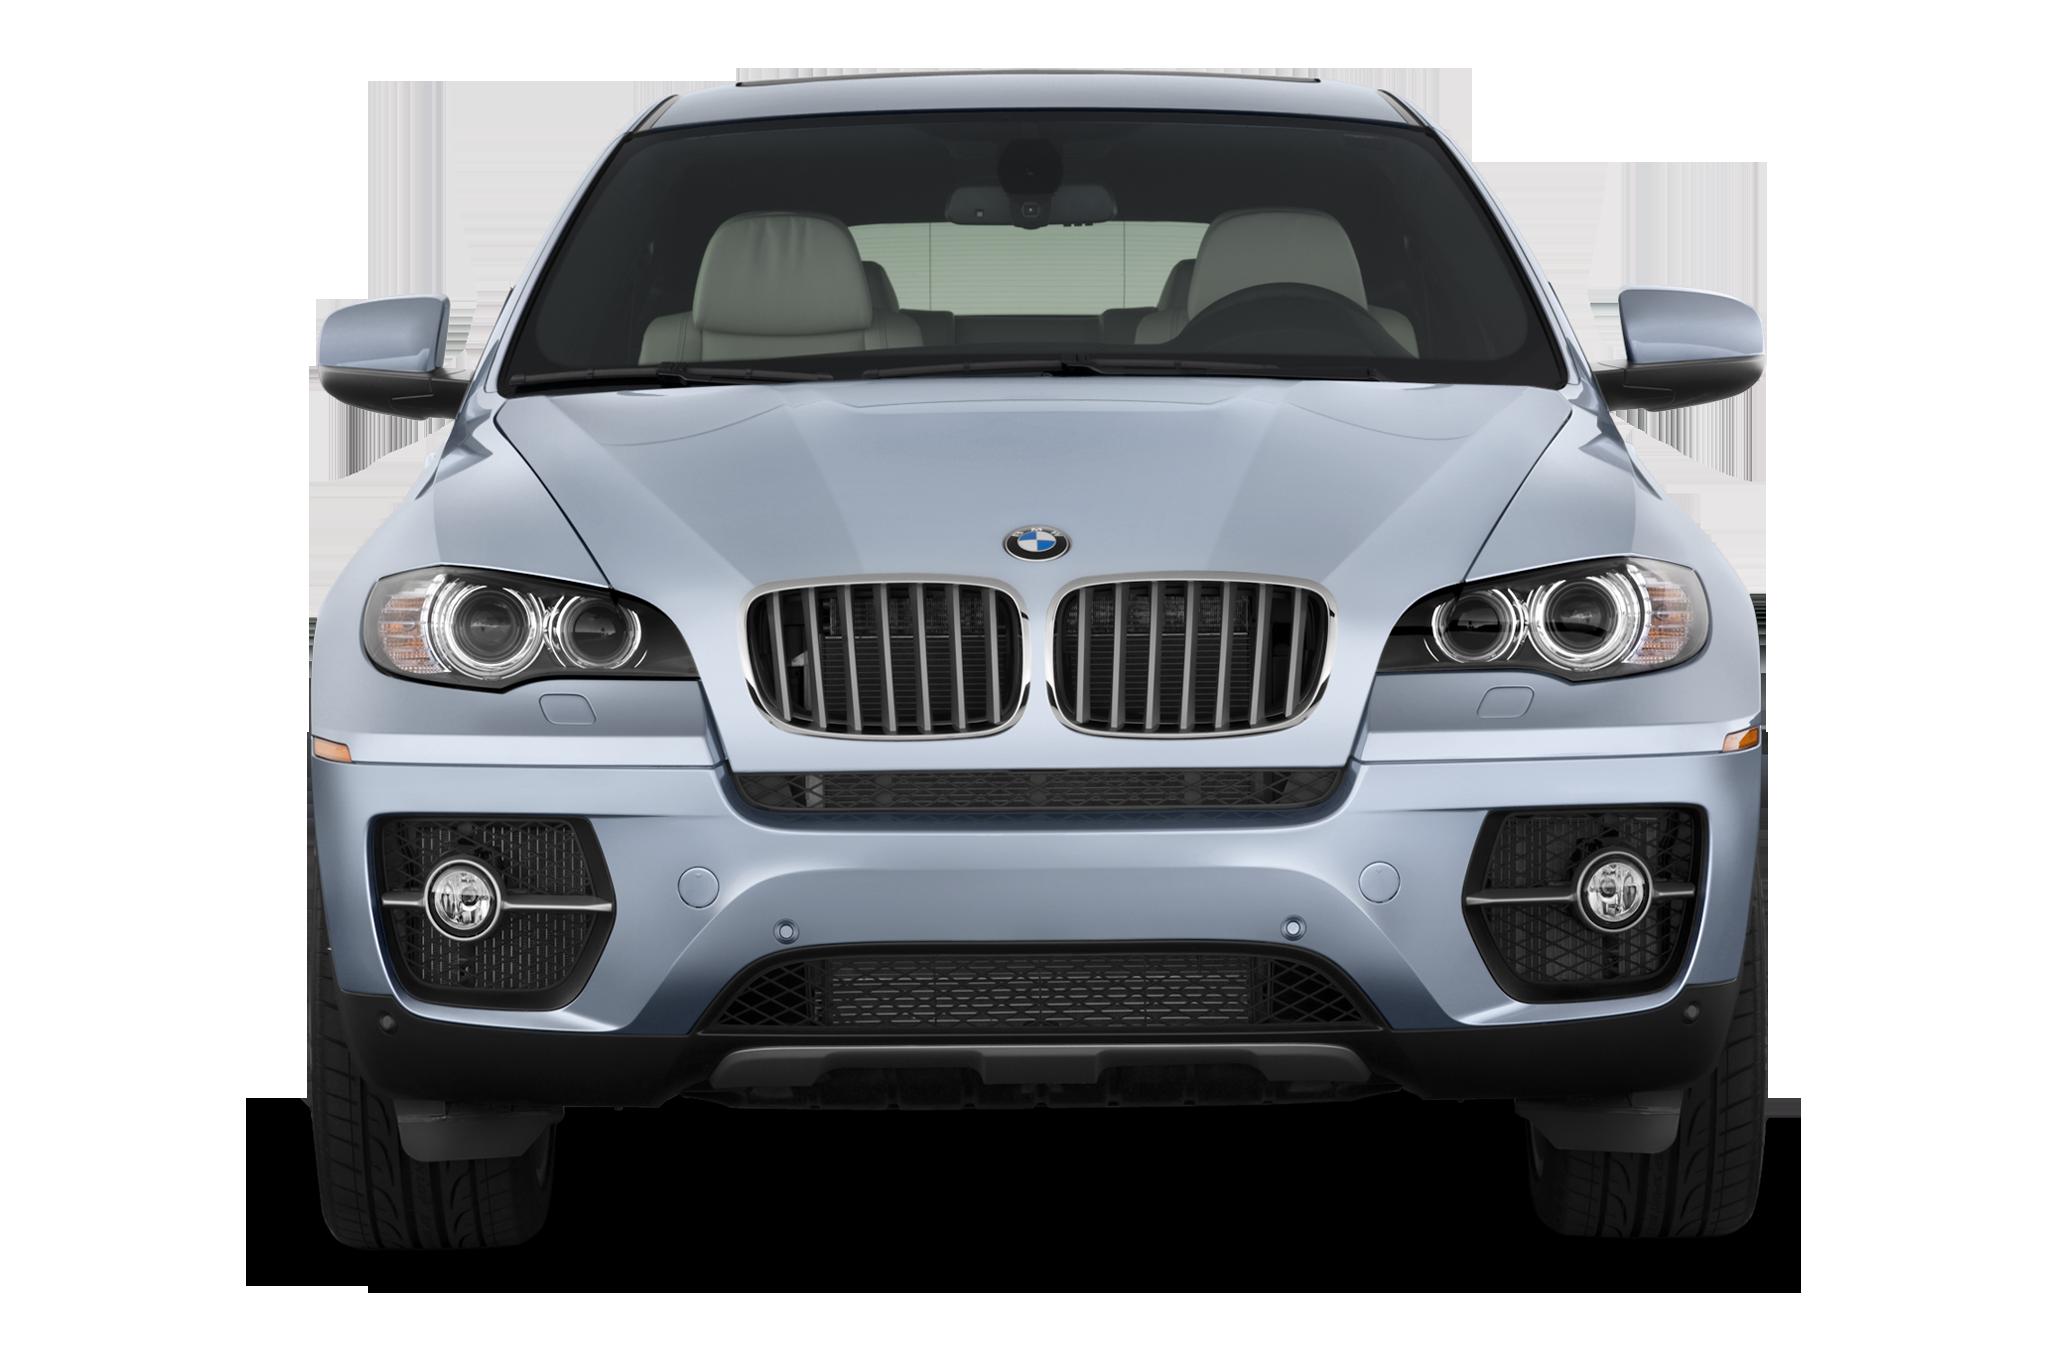 2010 BMW X6 ActiveHybrid Starts at $89,725